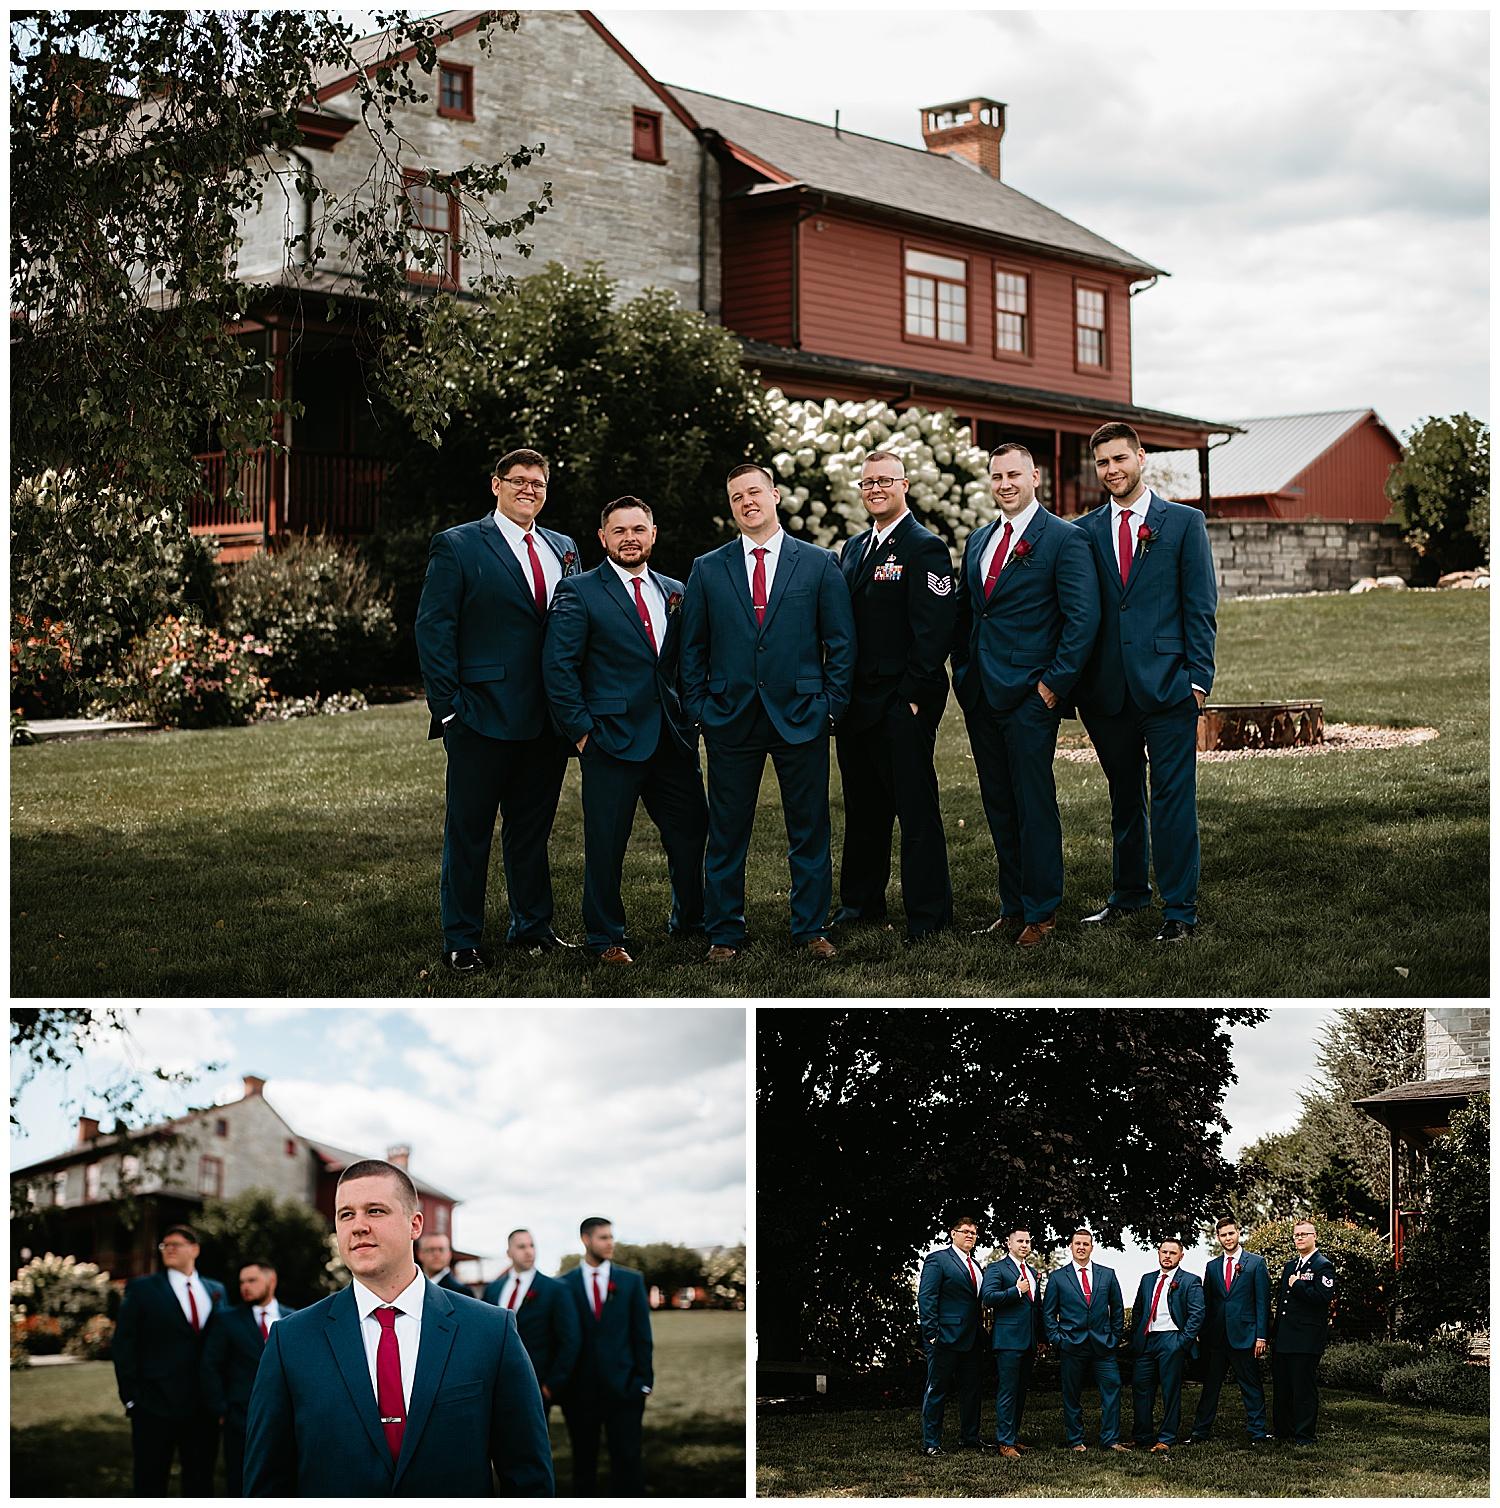 NEPA-Bloomgsburg-Wedding-Photographer-at-The-Barn-at-Greystone-Farms-Watsontown-PA_0050.jpg